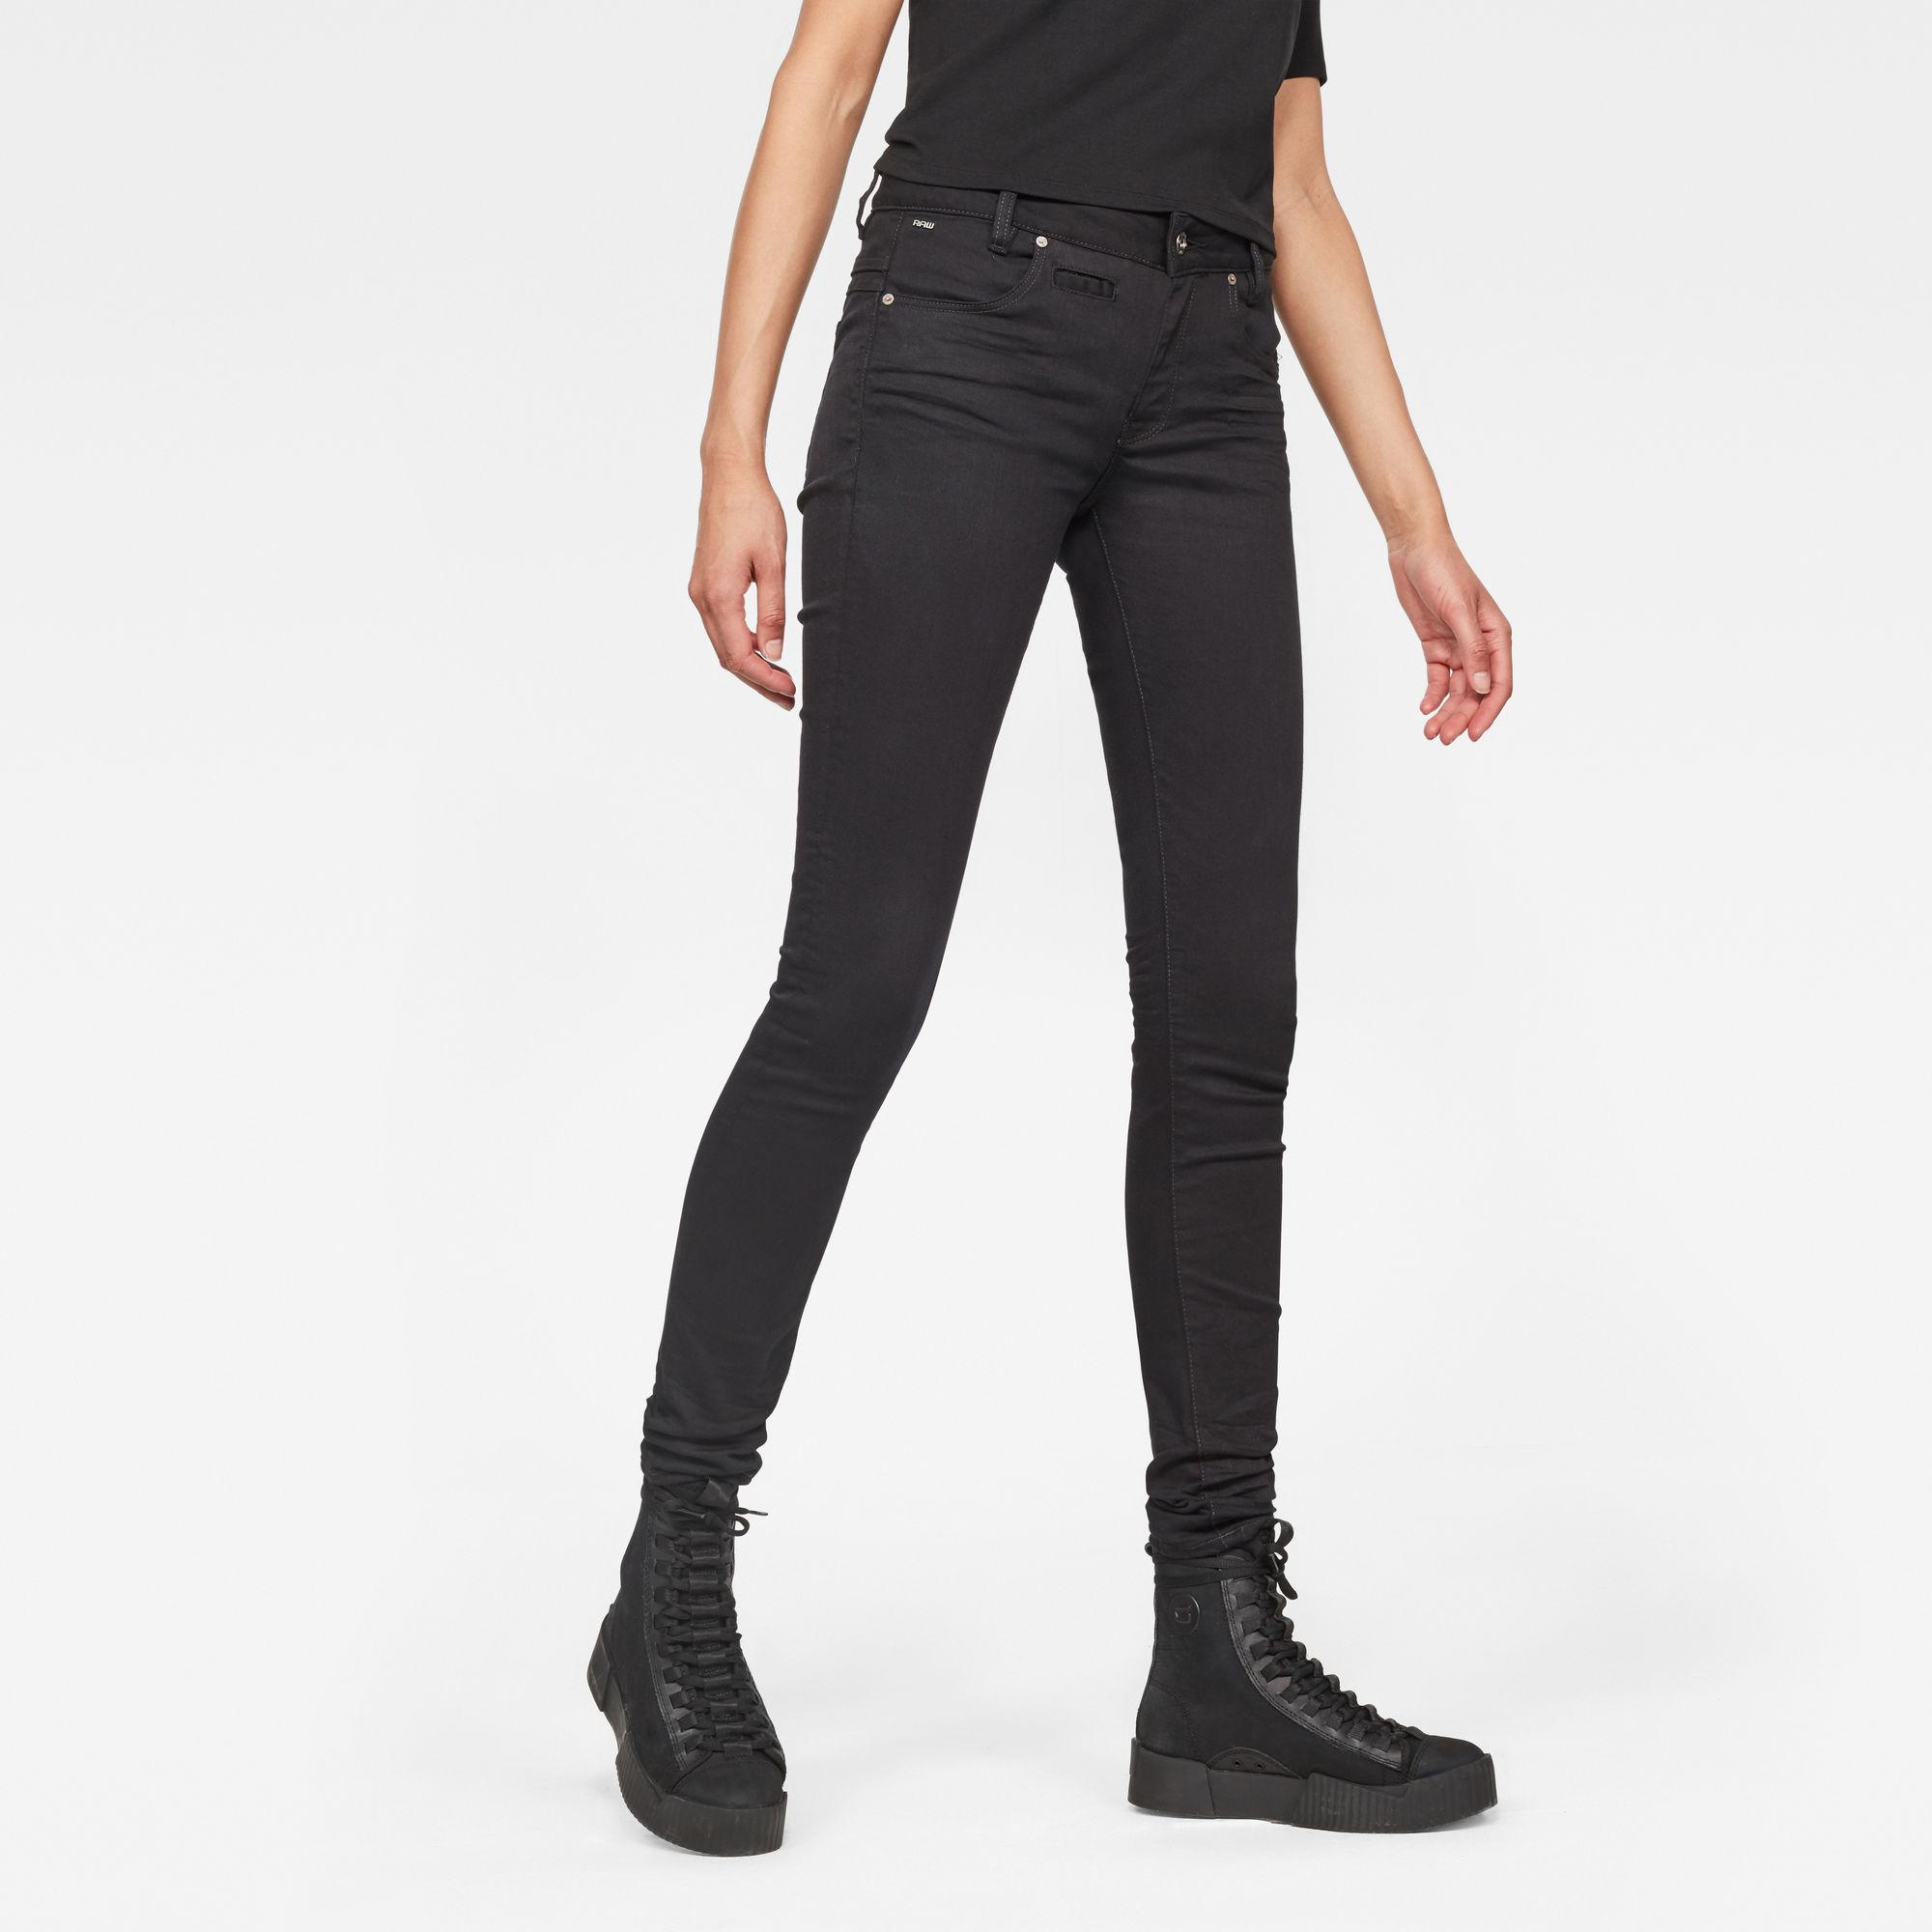 Van G Star Raw D-Staq 5-Pocket Mid-Waist Skinny Jeans Prijsvergelijk nu!